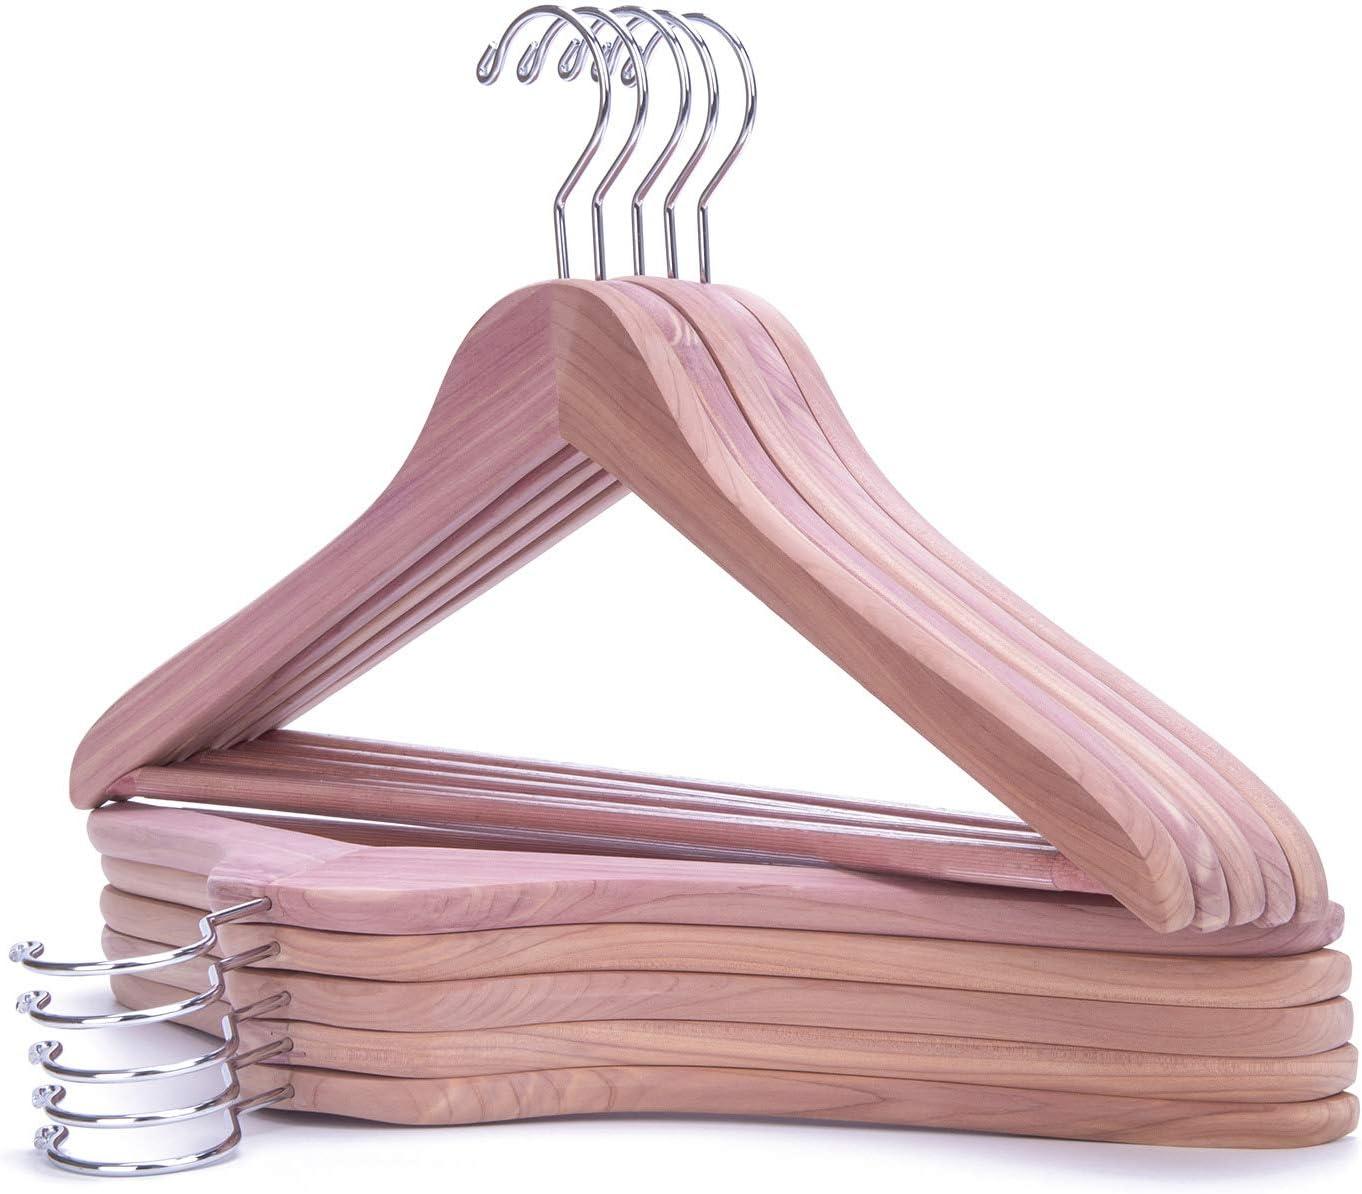 Natural Wooden Suit Coat Jacket Hangers Smooth Surface Wood Hangers Sturdy Cedar Wood Suit Coat Hanger with 360 Degree Swivel Hook Nature Smile Premium Aromatic American Red Cedar Hangers 10 Pack